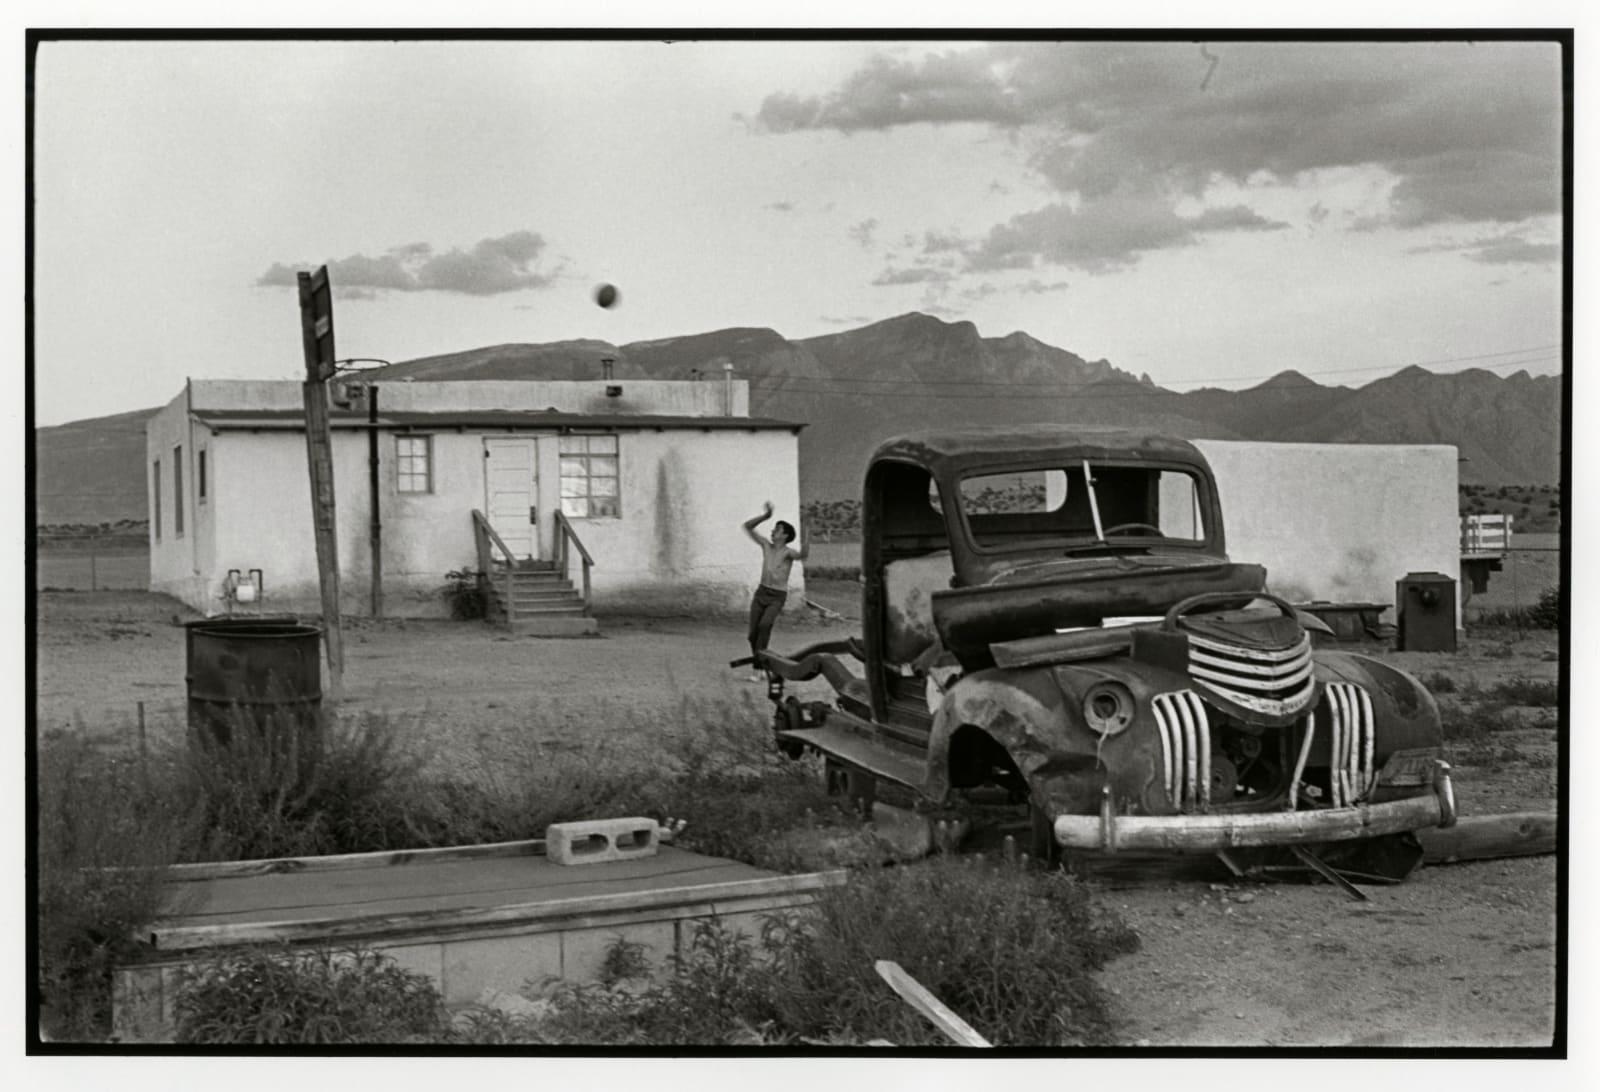 Danny Lyon - Llanito, New Mexico, 1970